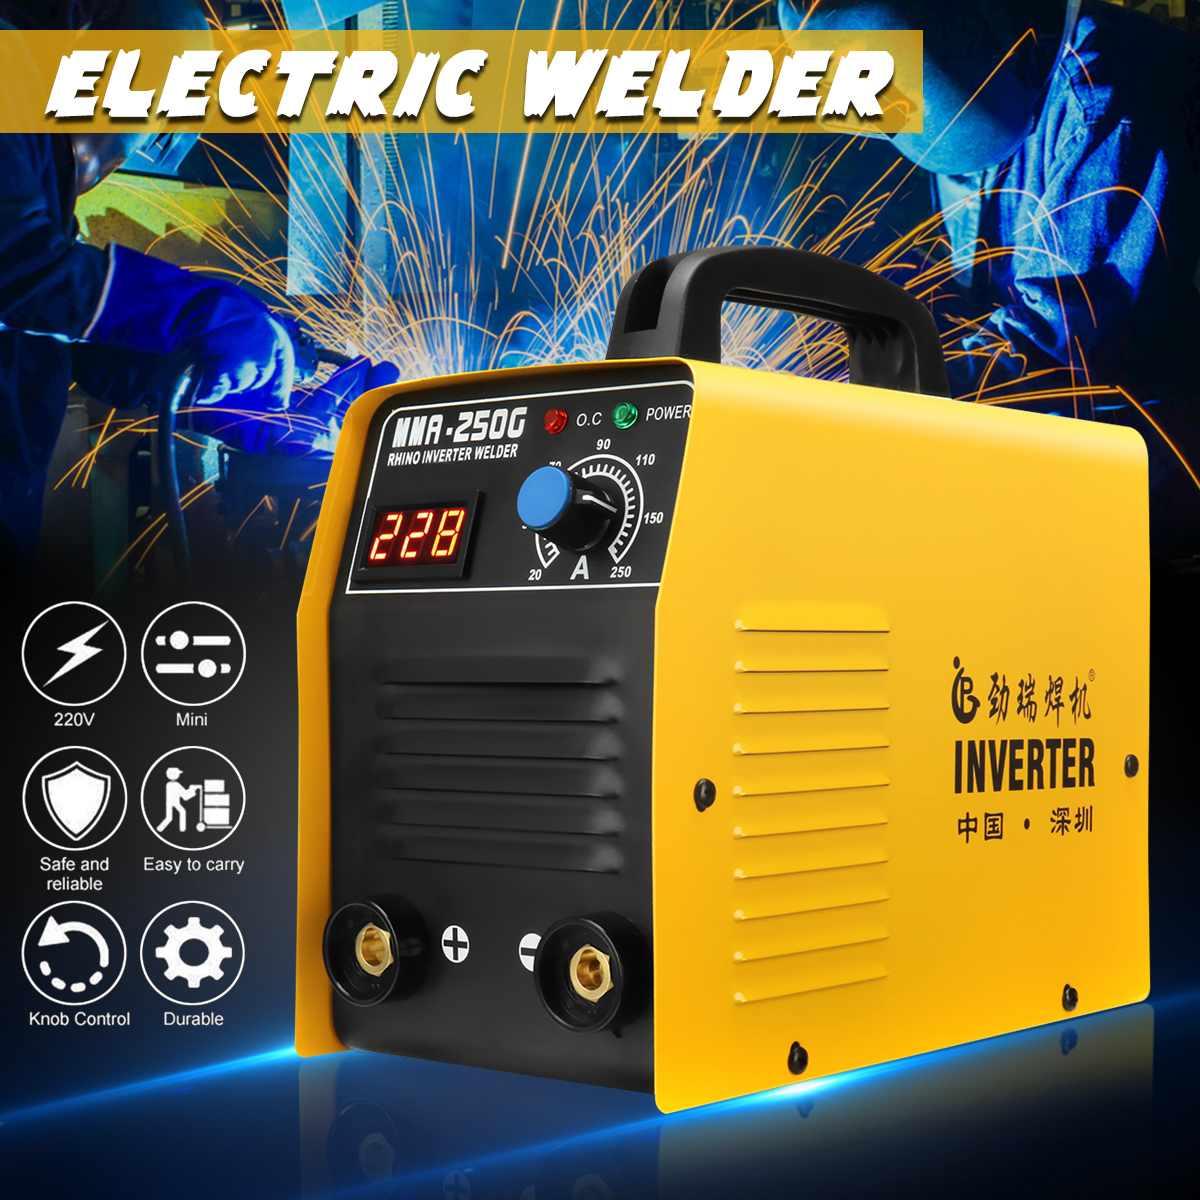 MMA-250G 220V Electric Arc Welders  IGBT Inverter MMA ARC Welding Soldering Machine Welding Equipment For Home Beginner